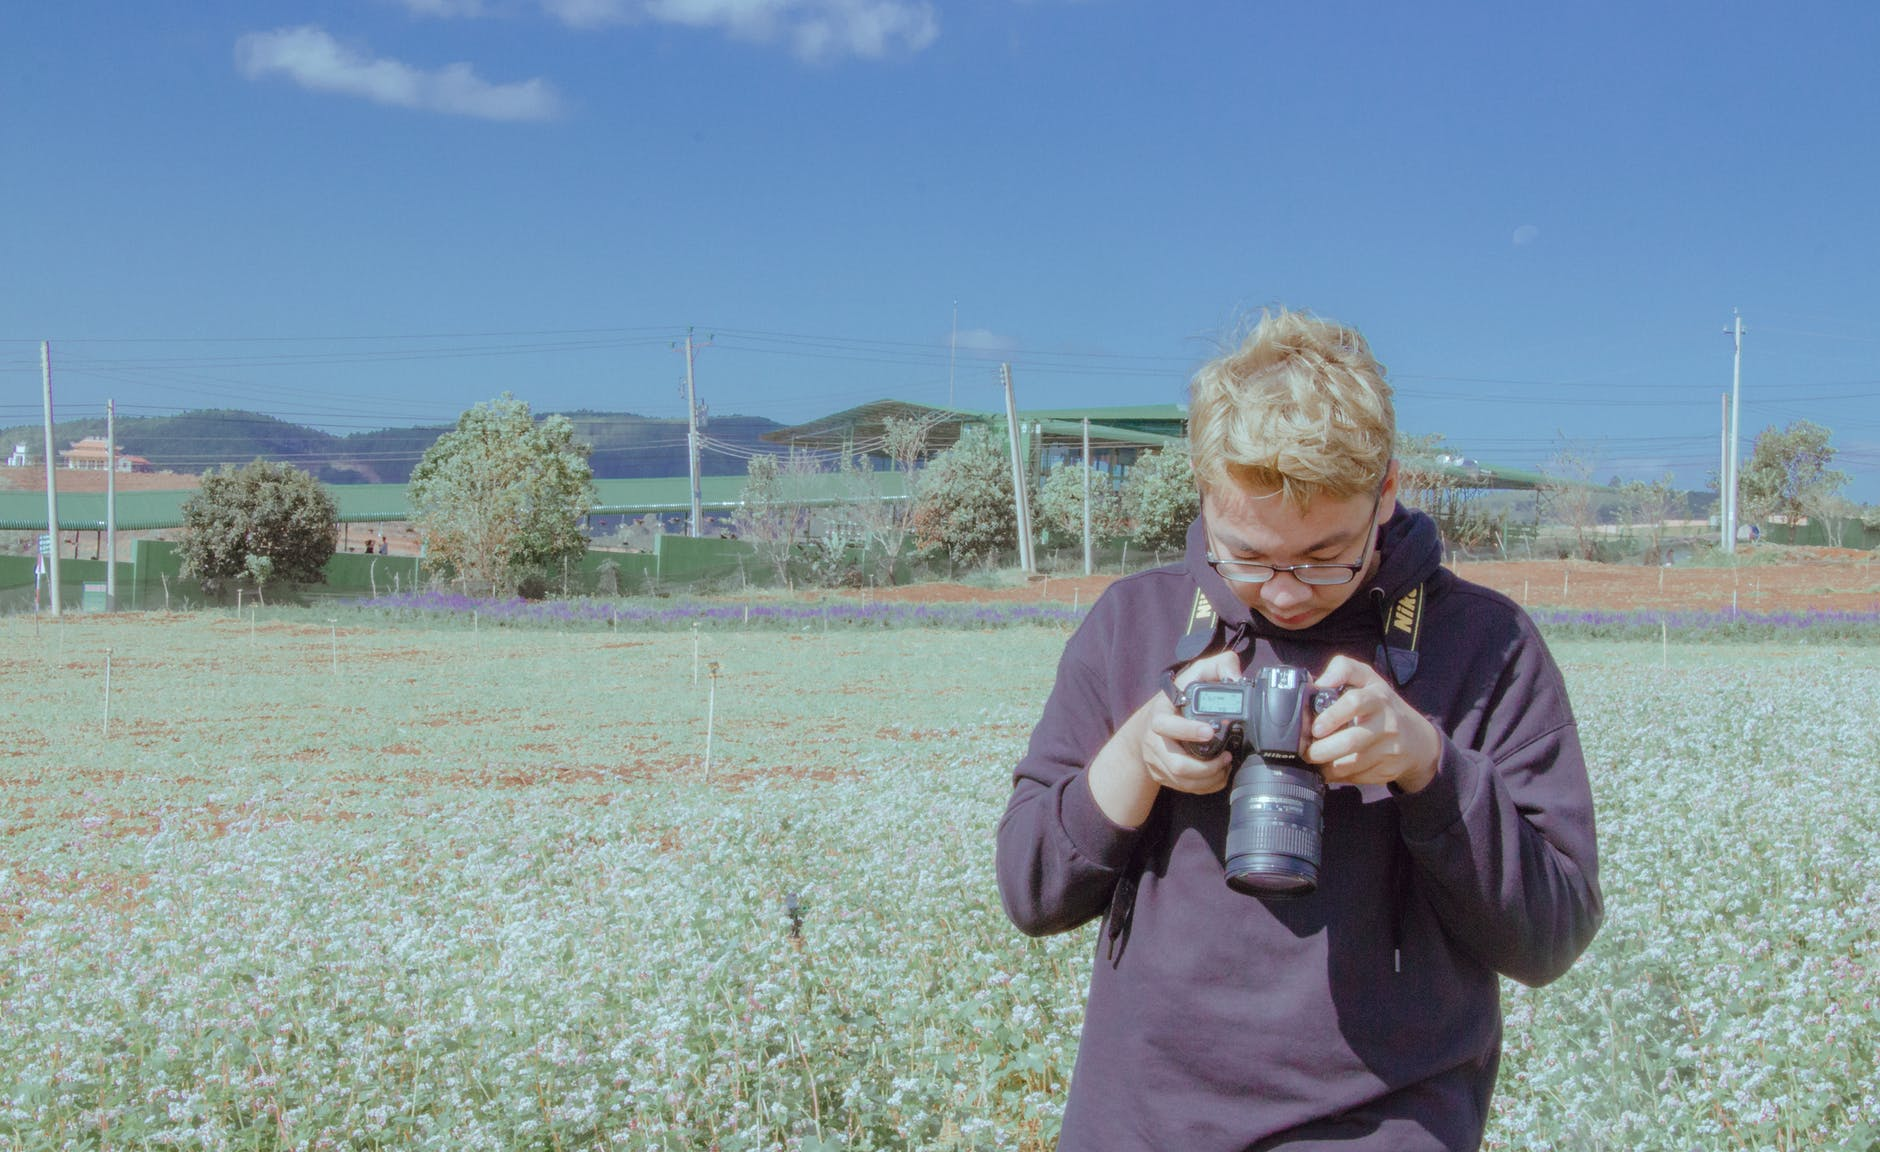 Man holding black dslr camera standing on open field under blue sky photo